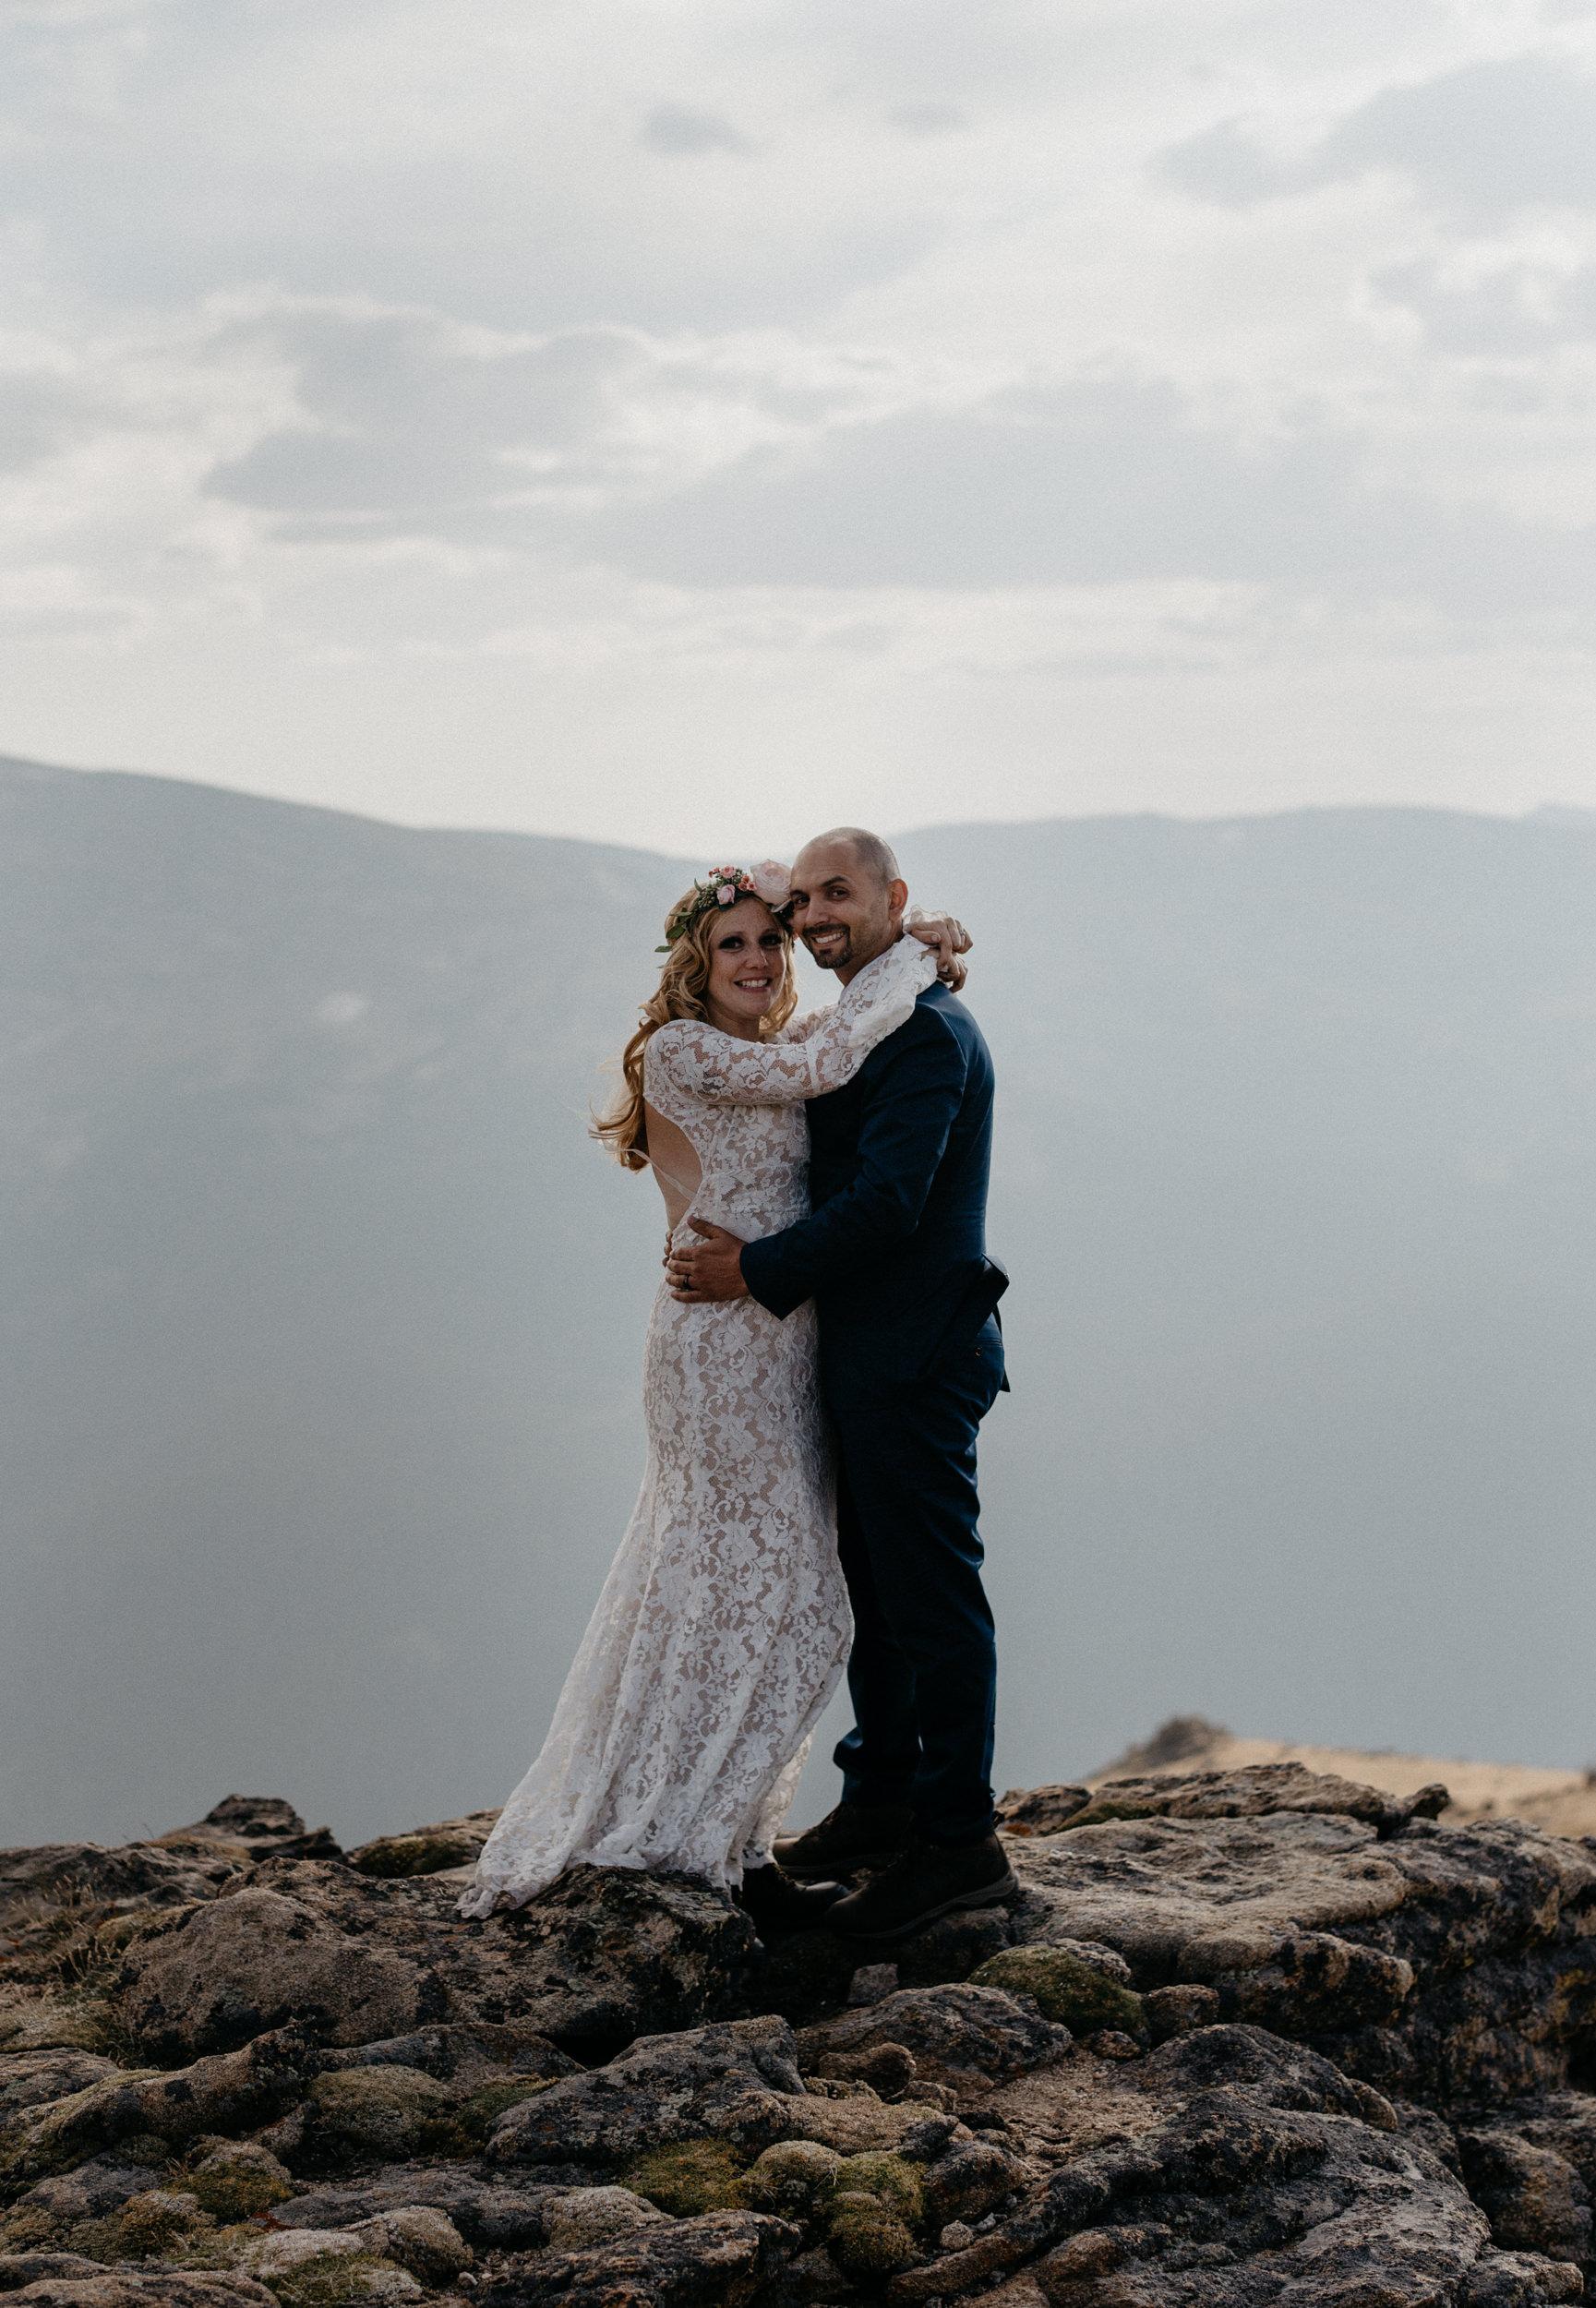 Colorado intimate wedding and elopement photographer.. RMNP elopement.